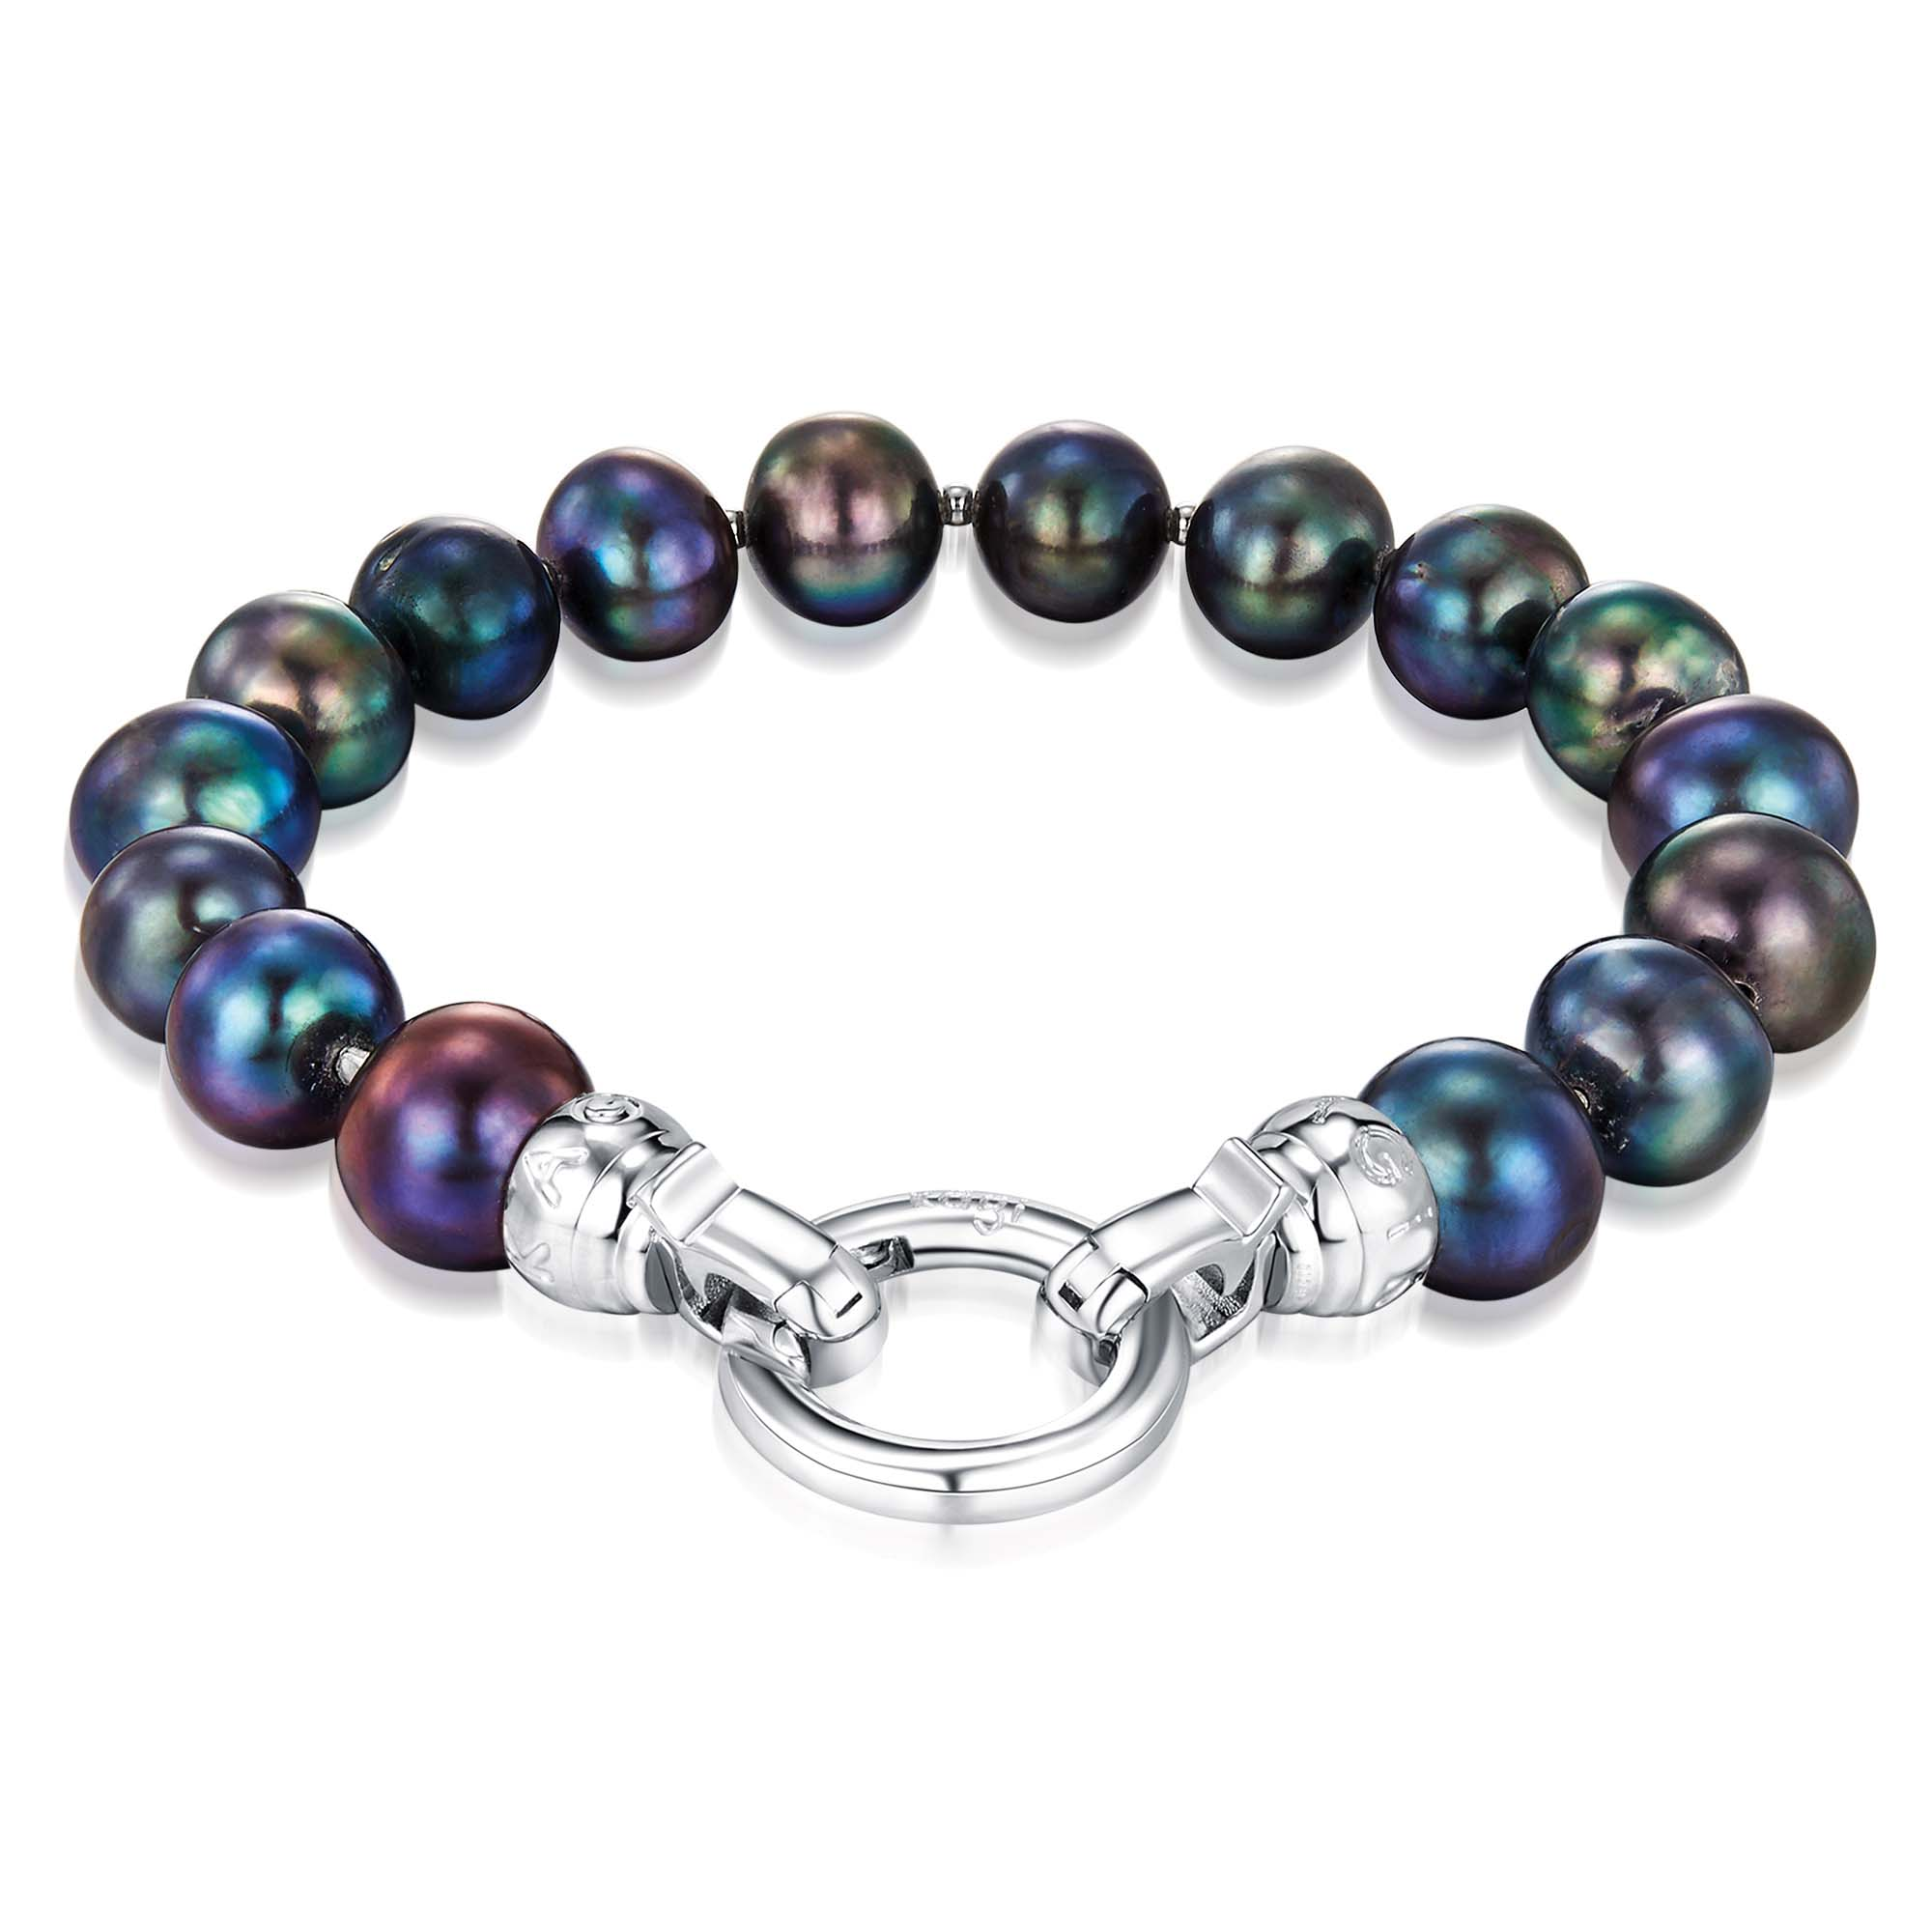 Kagi Peacock Pearl Bracelet $159 www.kagi.net